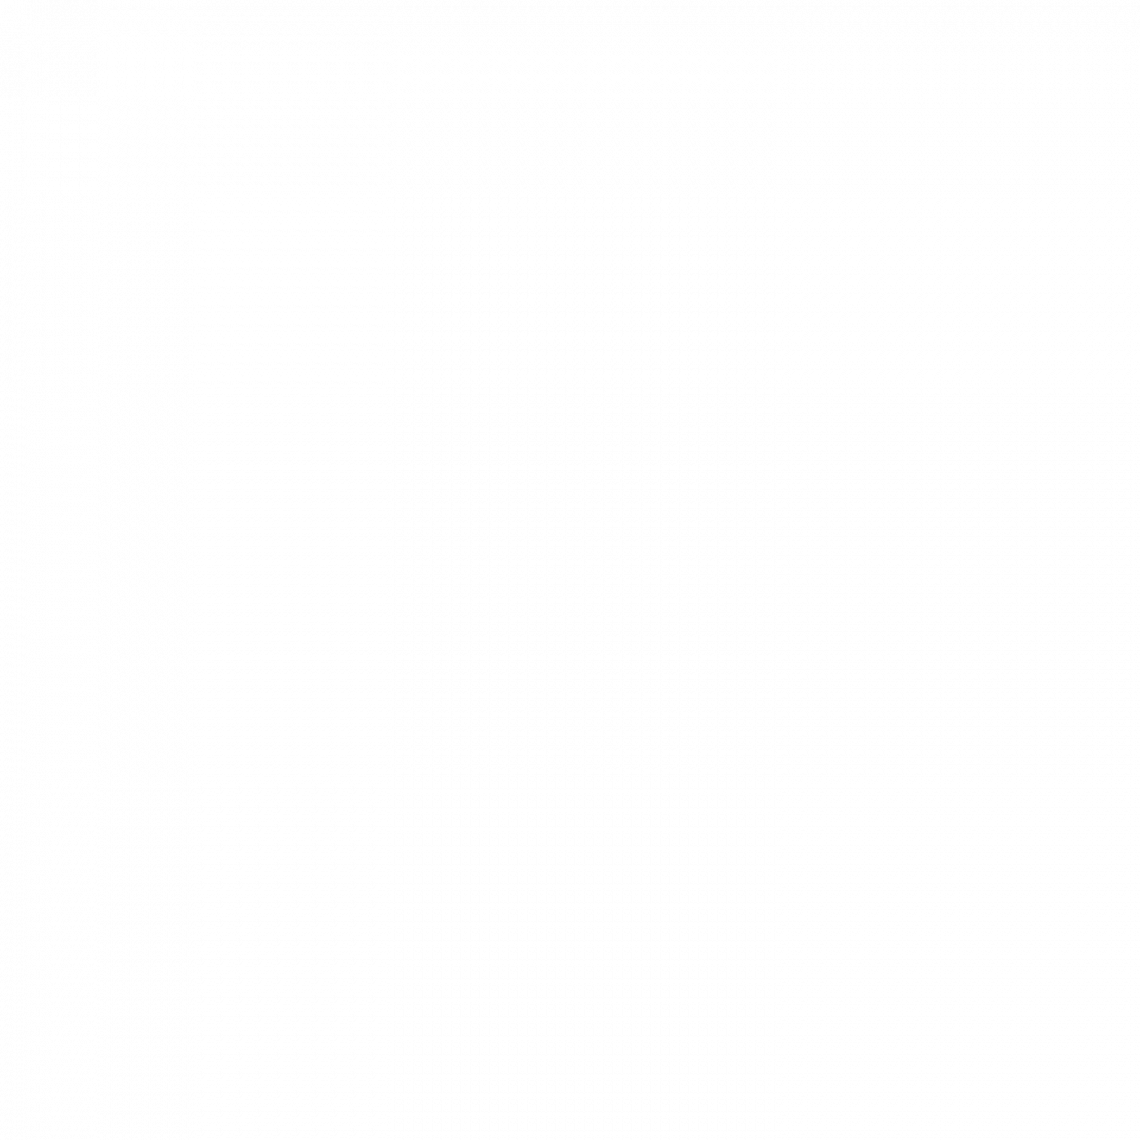 starsfg1